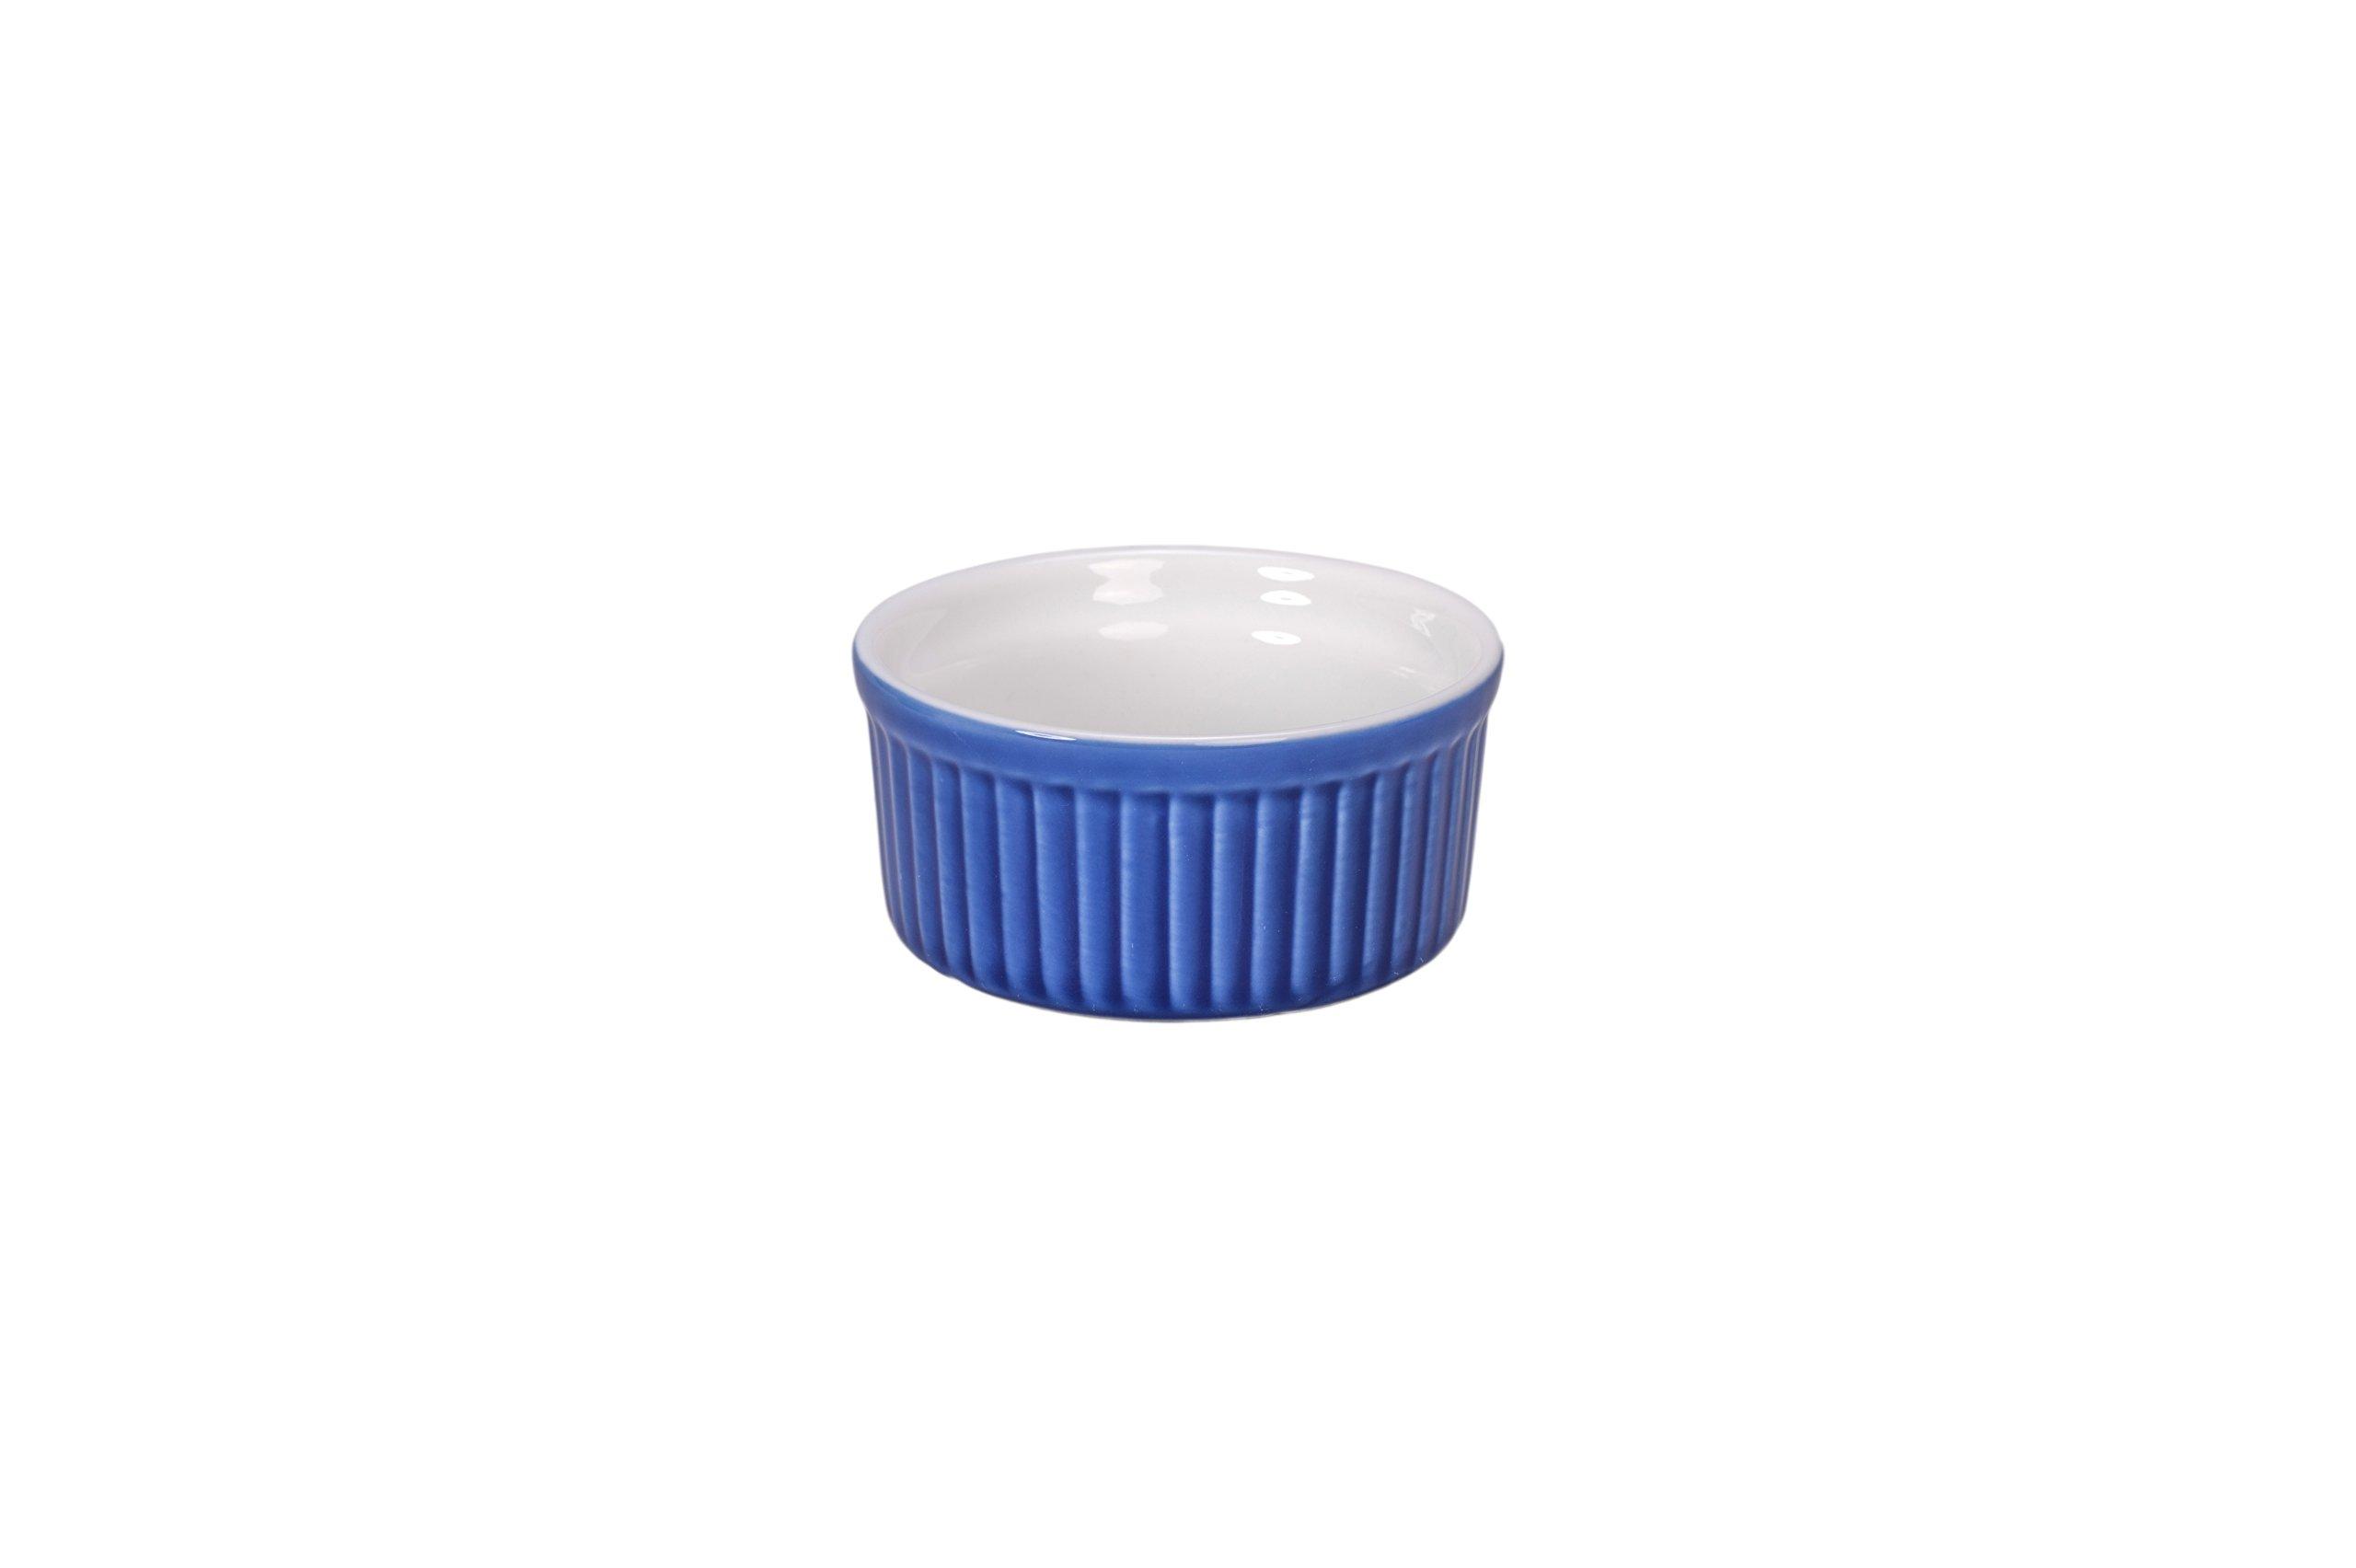 BIA Cordon Bleu 900013+3091S4SIOC Individual Bakeware Souffle Dish, Blue/White